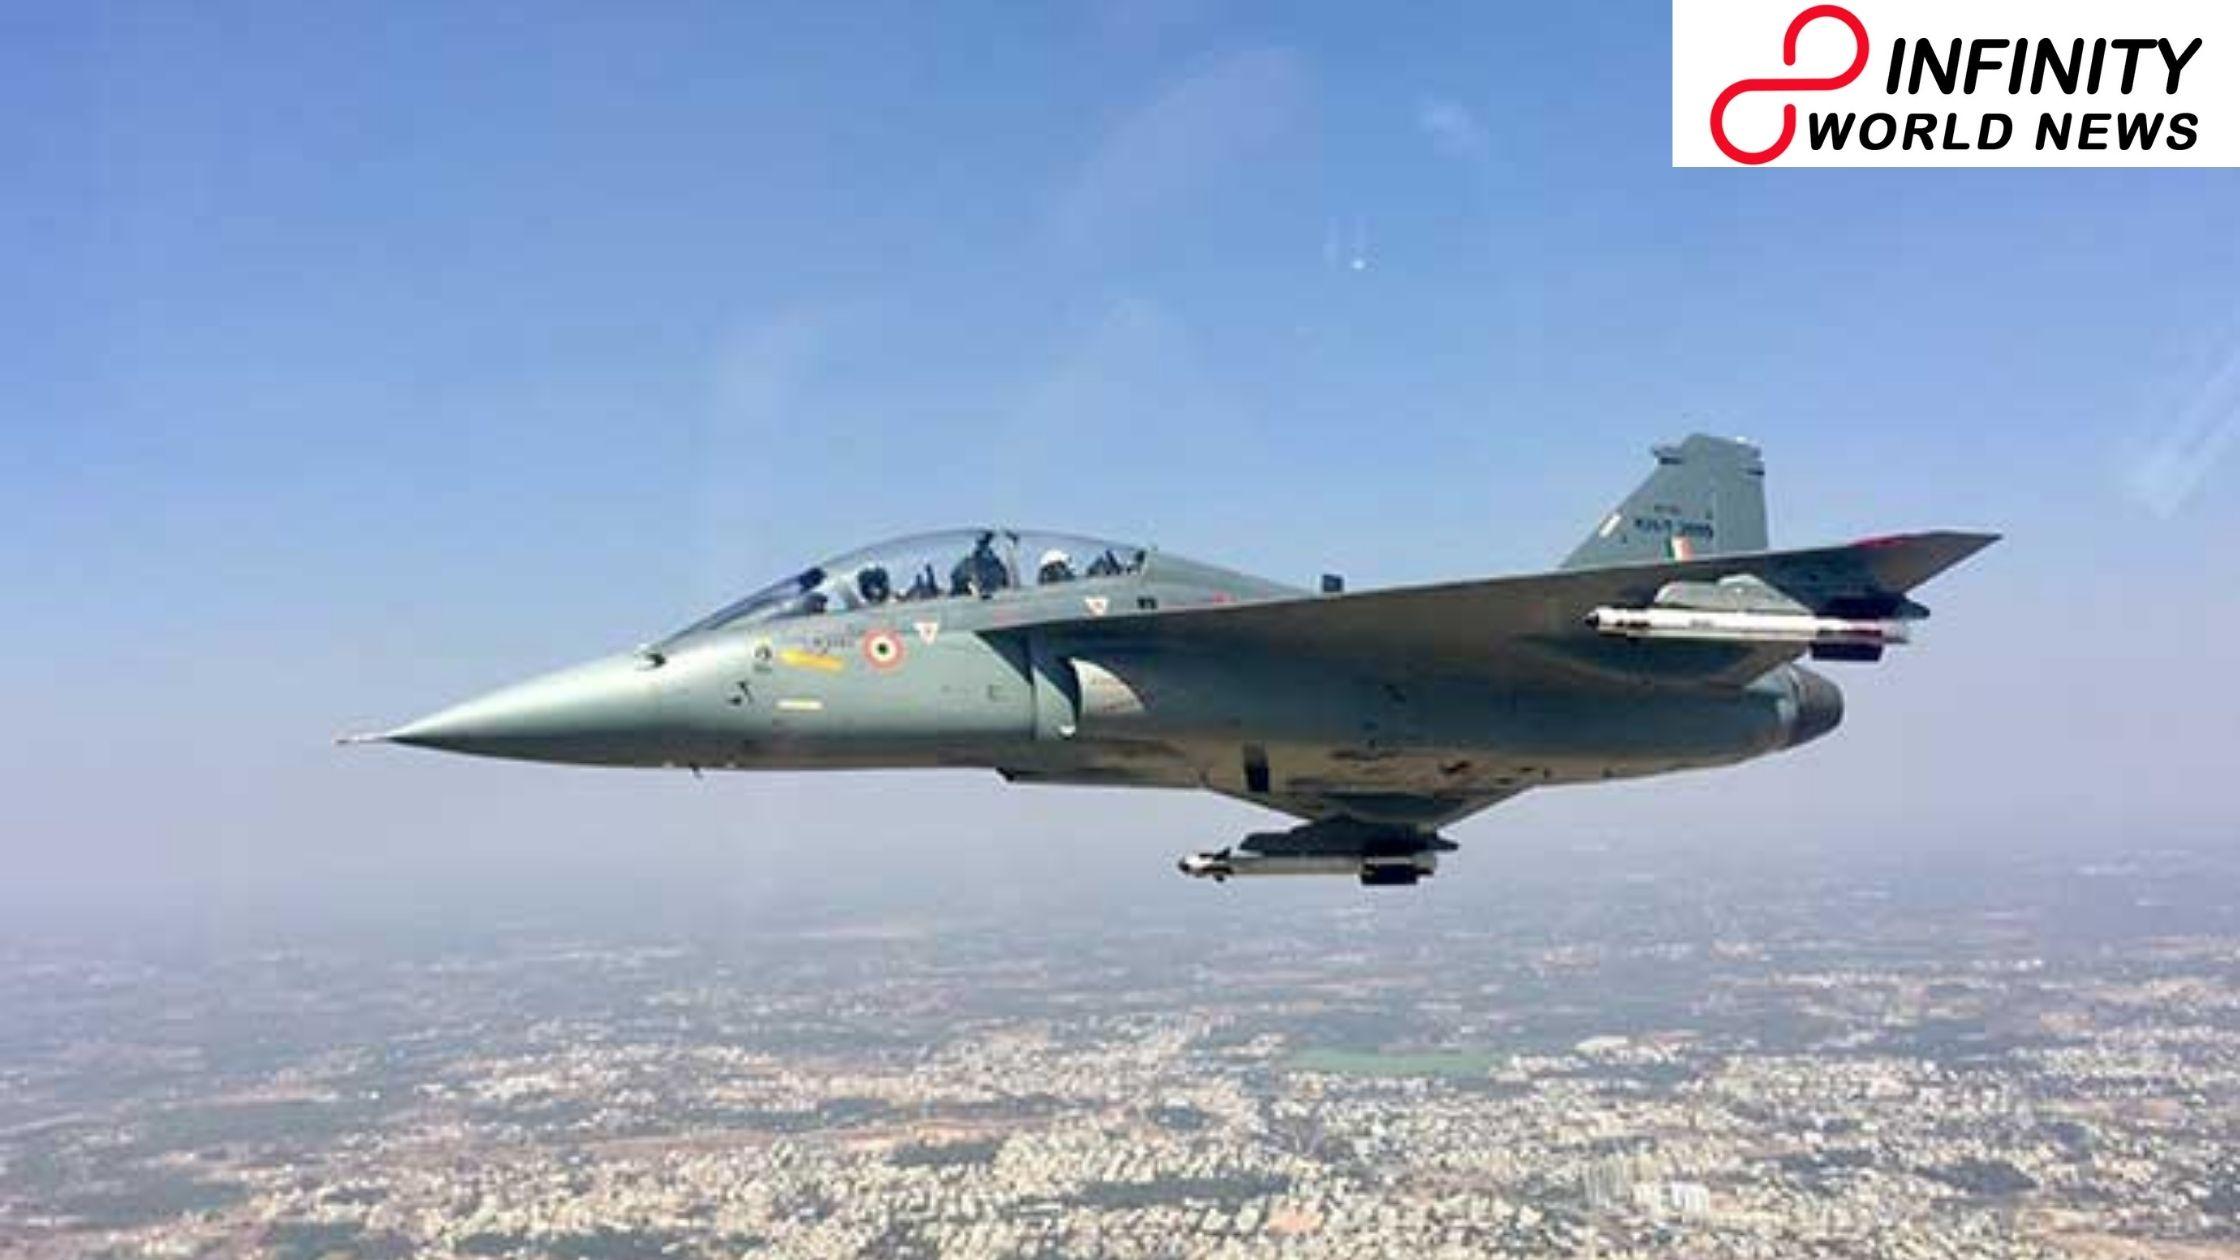 10 Notions To Know Regarding The Tejas Light Combat Aircraft